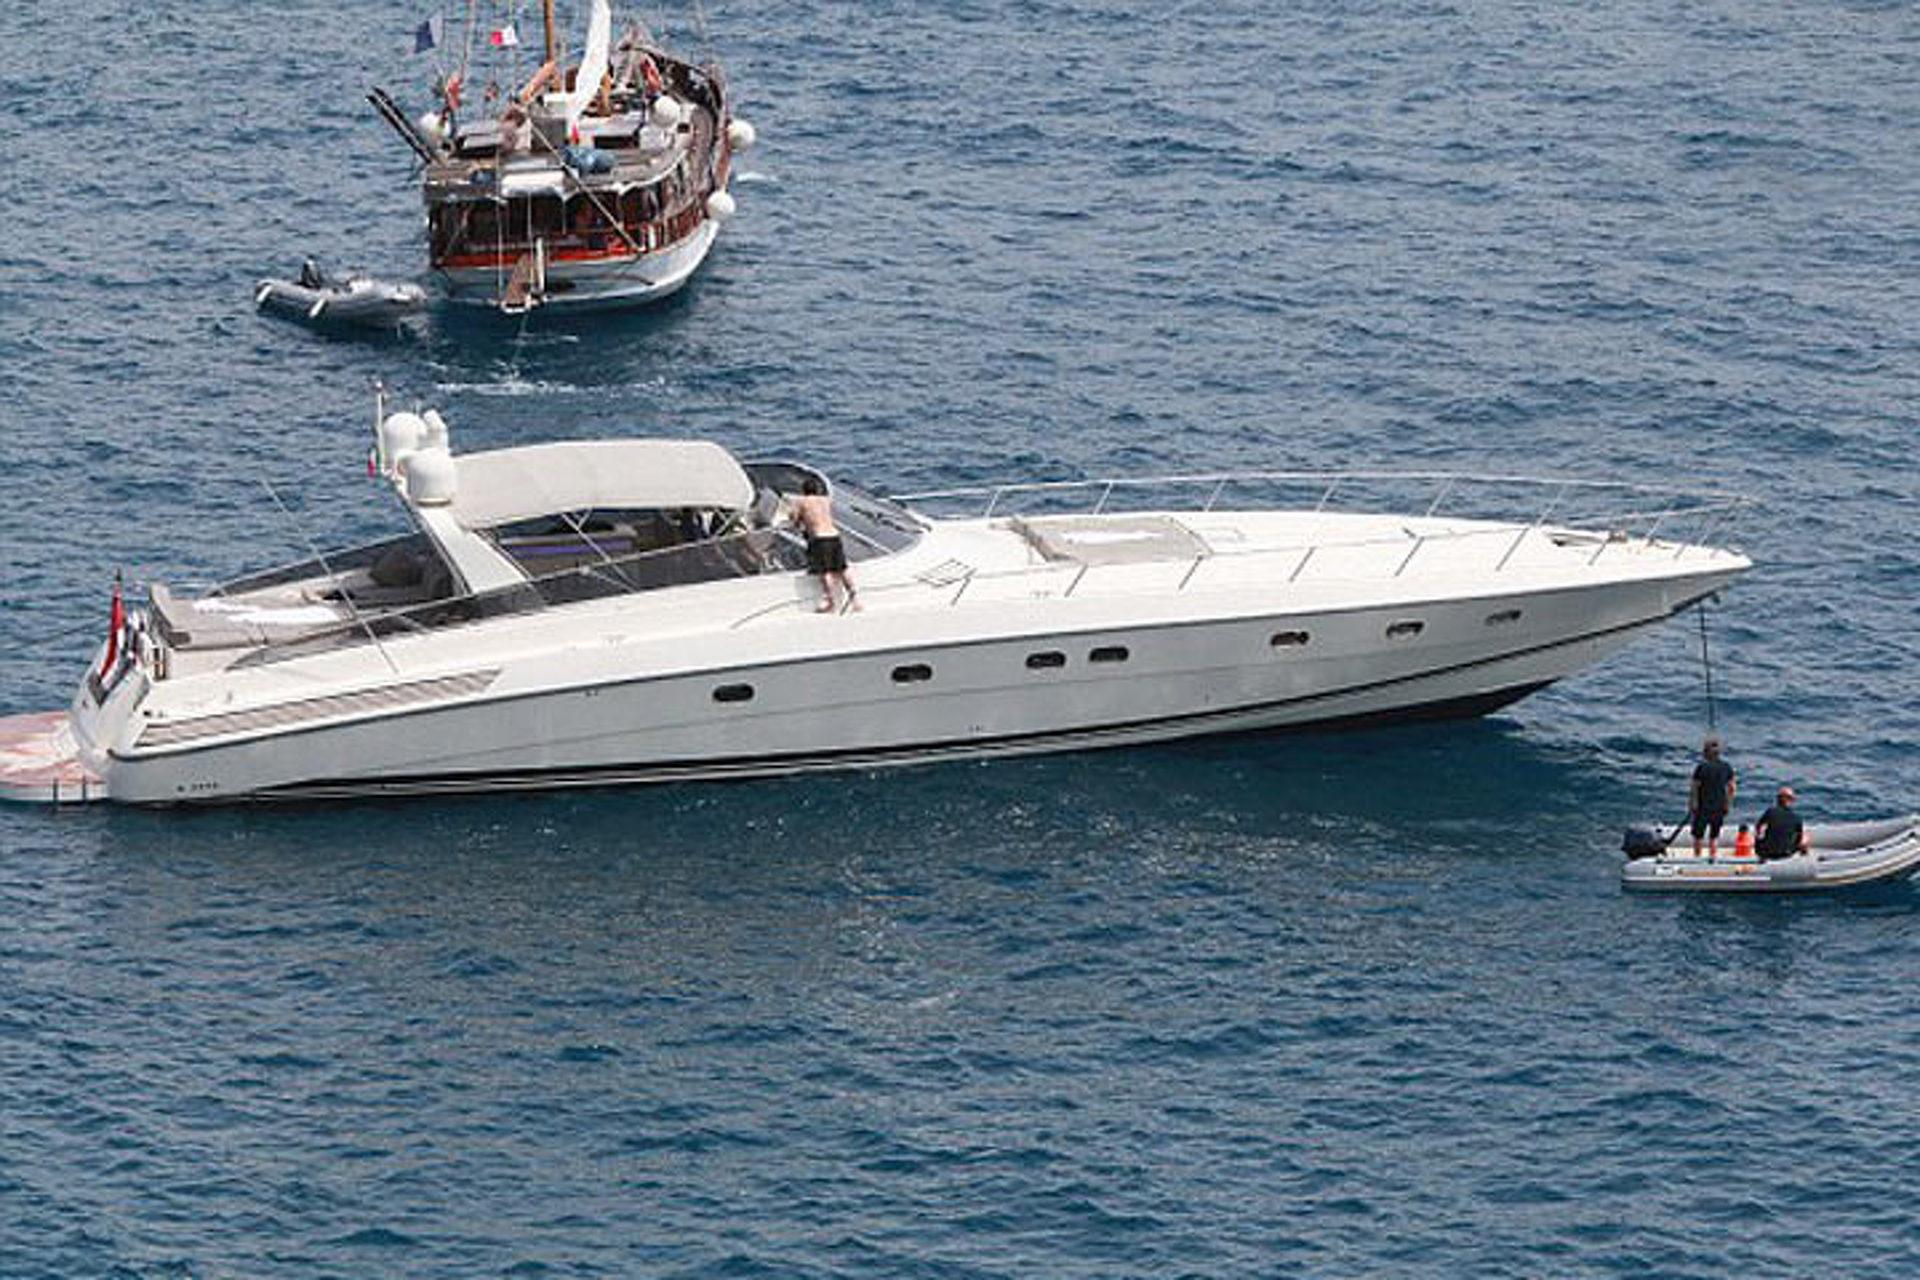 Ex-F1 Driver Eddie Irvine Keeps Good Company Aboard his $20 Million Yacht